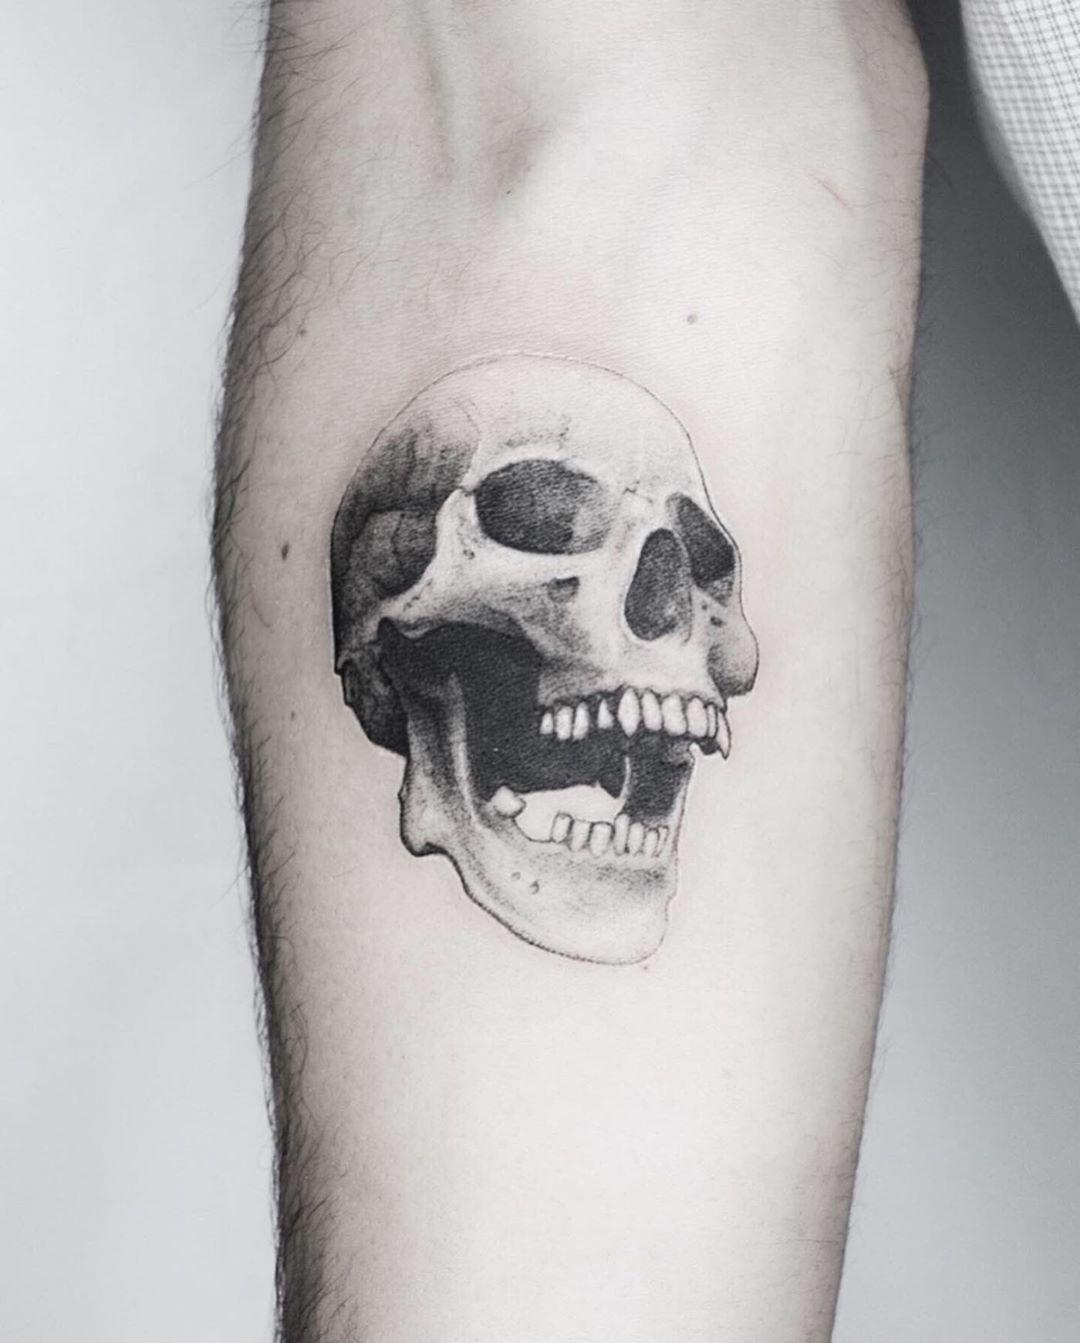 💀 . . . . . #tattoo #fineline #blackwork #animaltattoo #geometrictattoos #realistictattoos #realism #realismo #microrealismo #microrealism #death #skulltattoo #skull